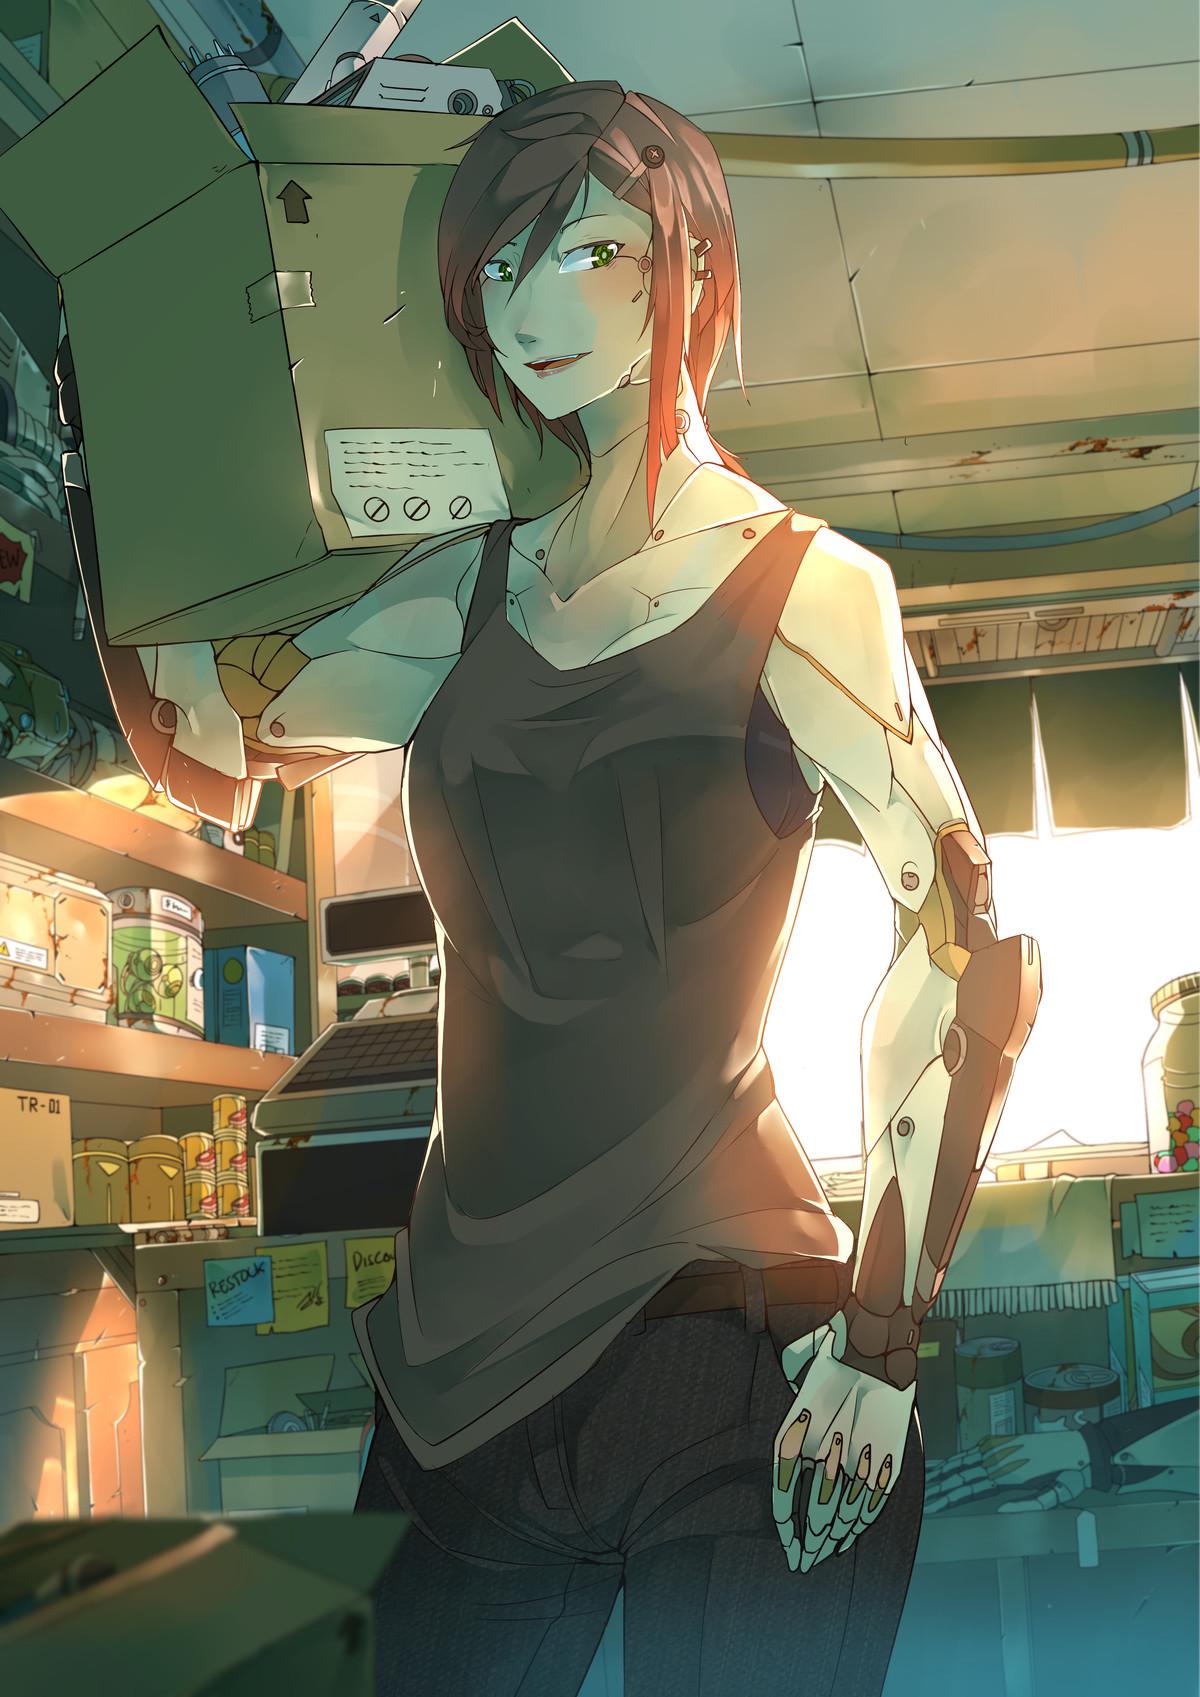 Robo/Cyborg chicks. Where flesh fails, machine prevails - ..